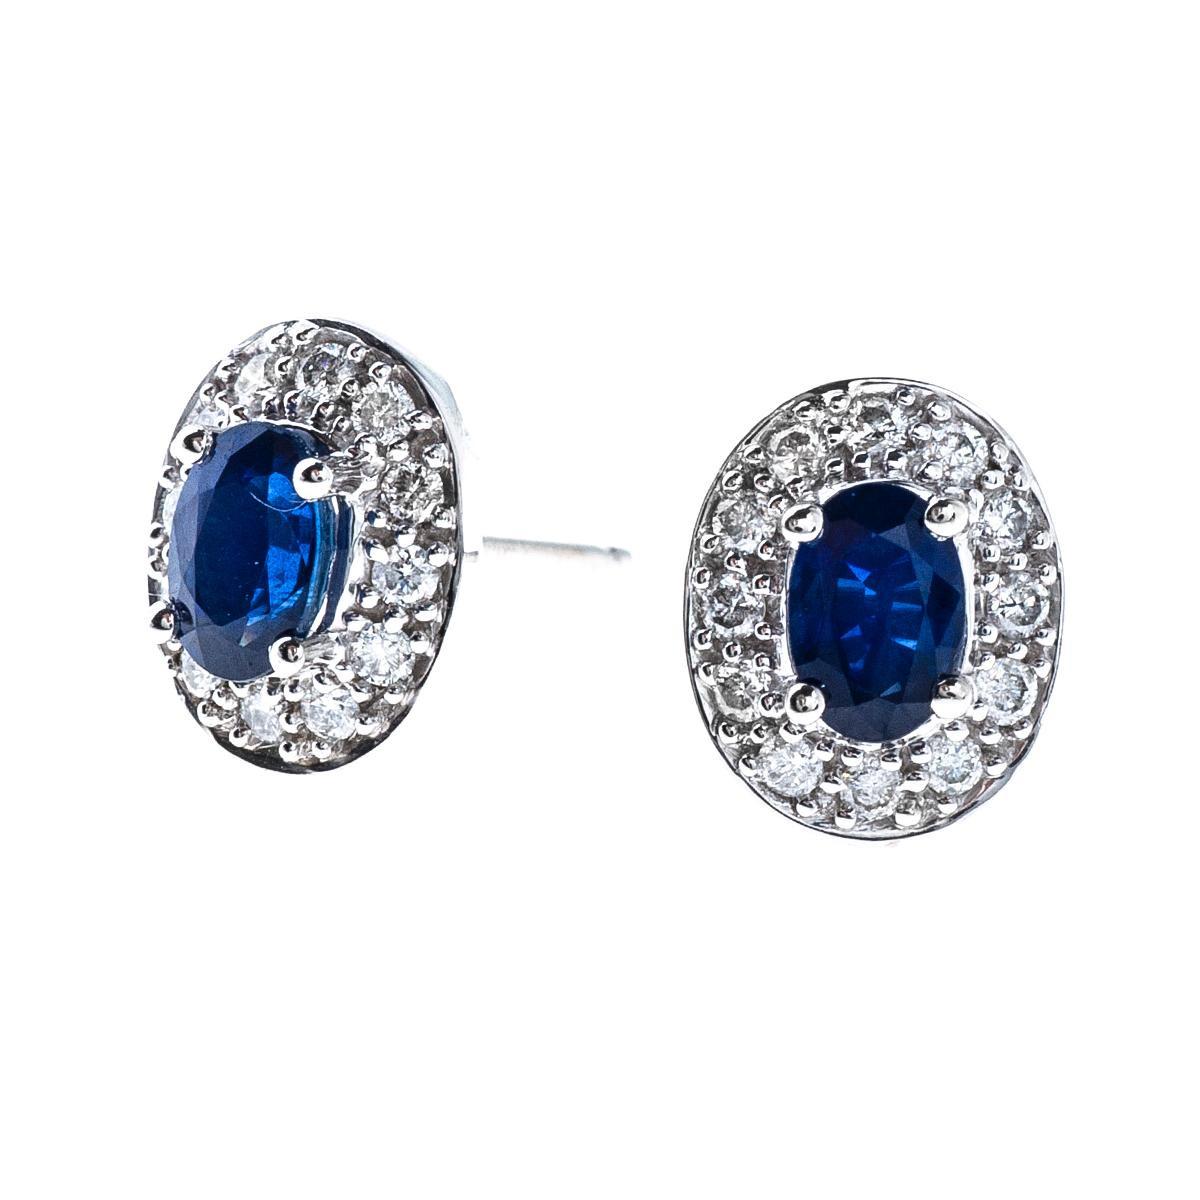 1.16 CTW Sapphire & Diamond Earrings